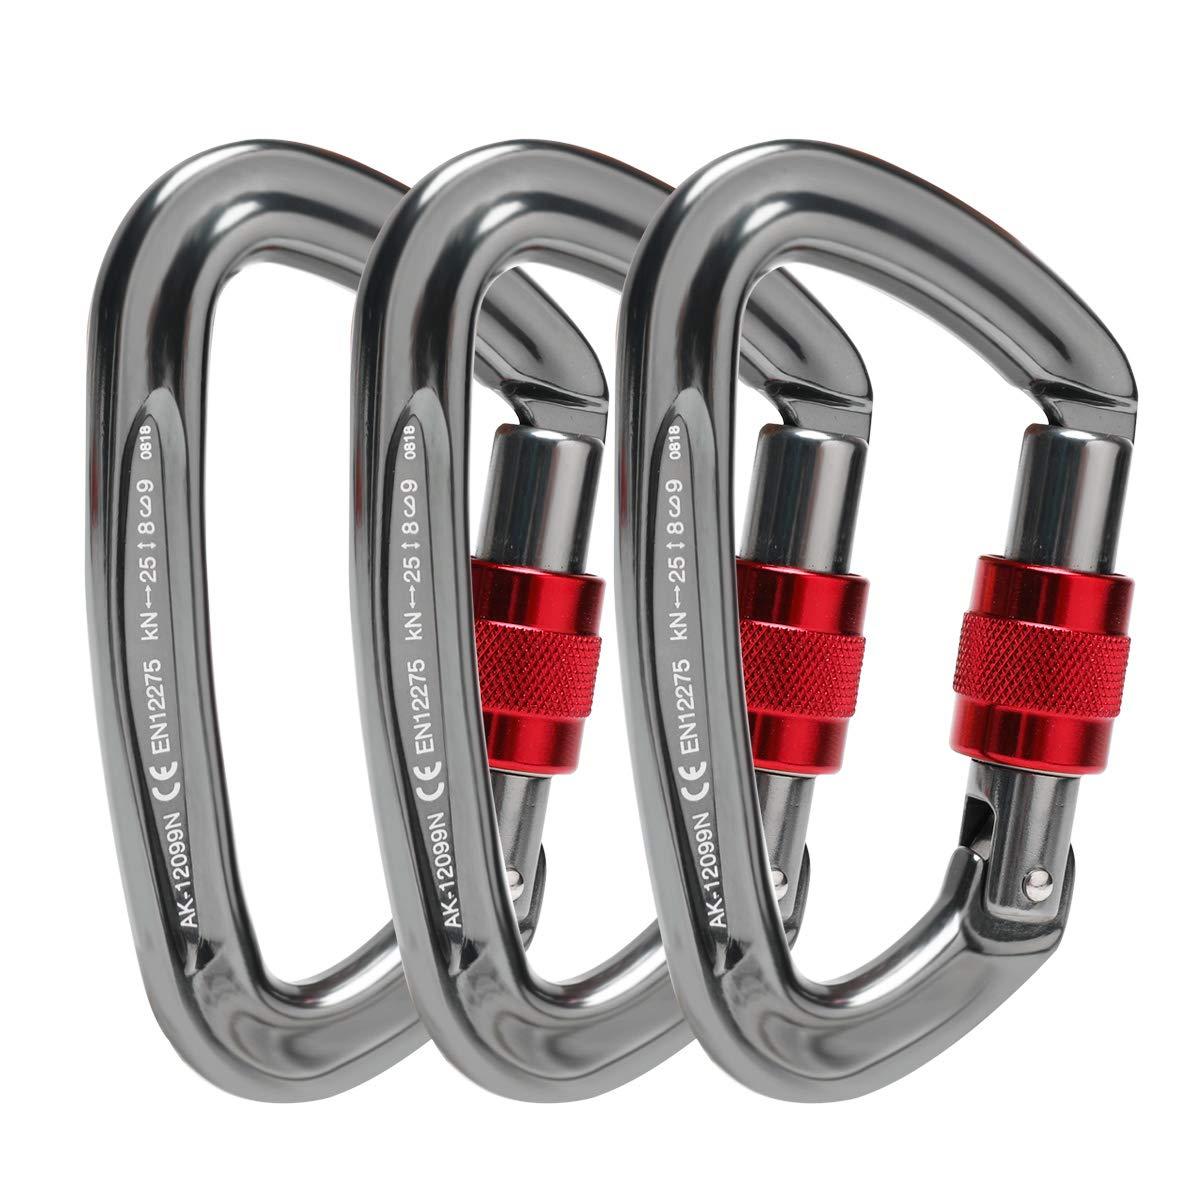 Locking Carabiner - 25kN 5600lb Climbing Carabiner Screw Gate D Shape Carabiner Silver (Pack of 3)